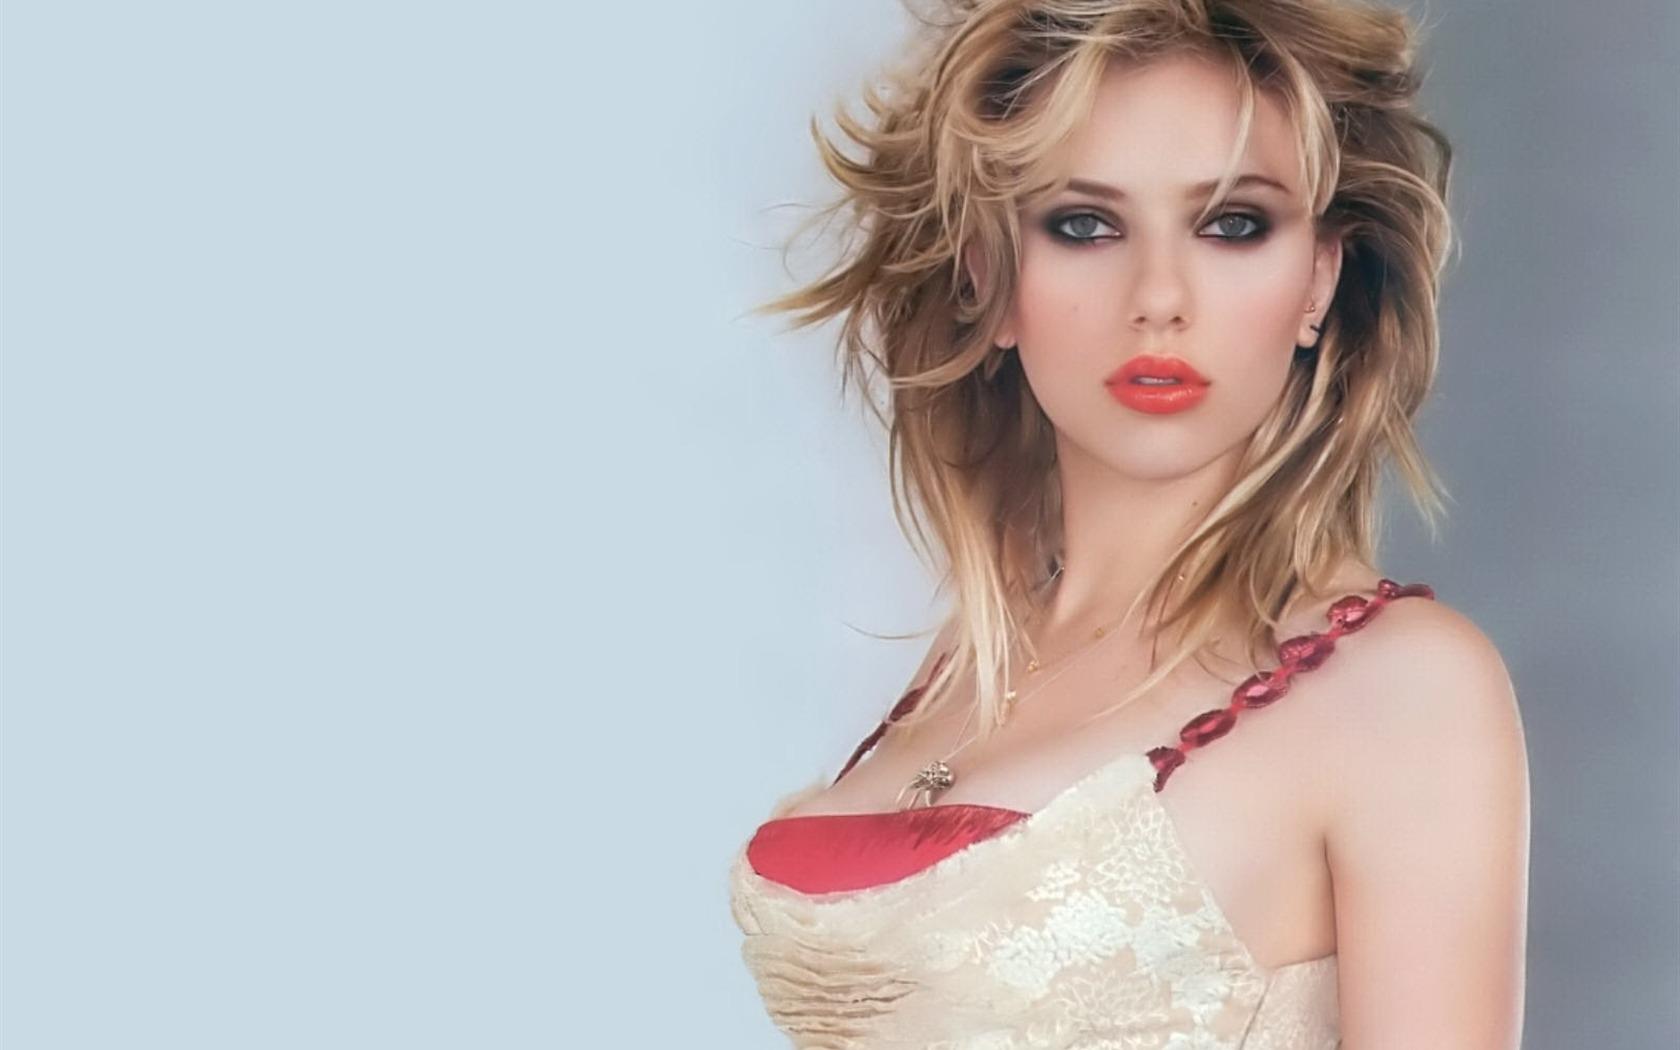 Scarlett Johansson 斯嘉丽·约翰逊 美女壁纸(二)30 ... Scarlett Johansson